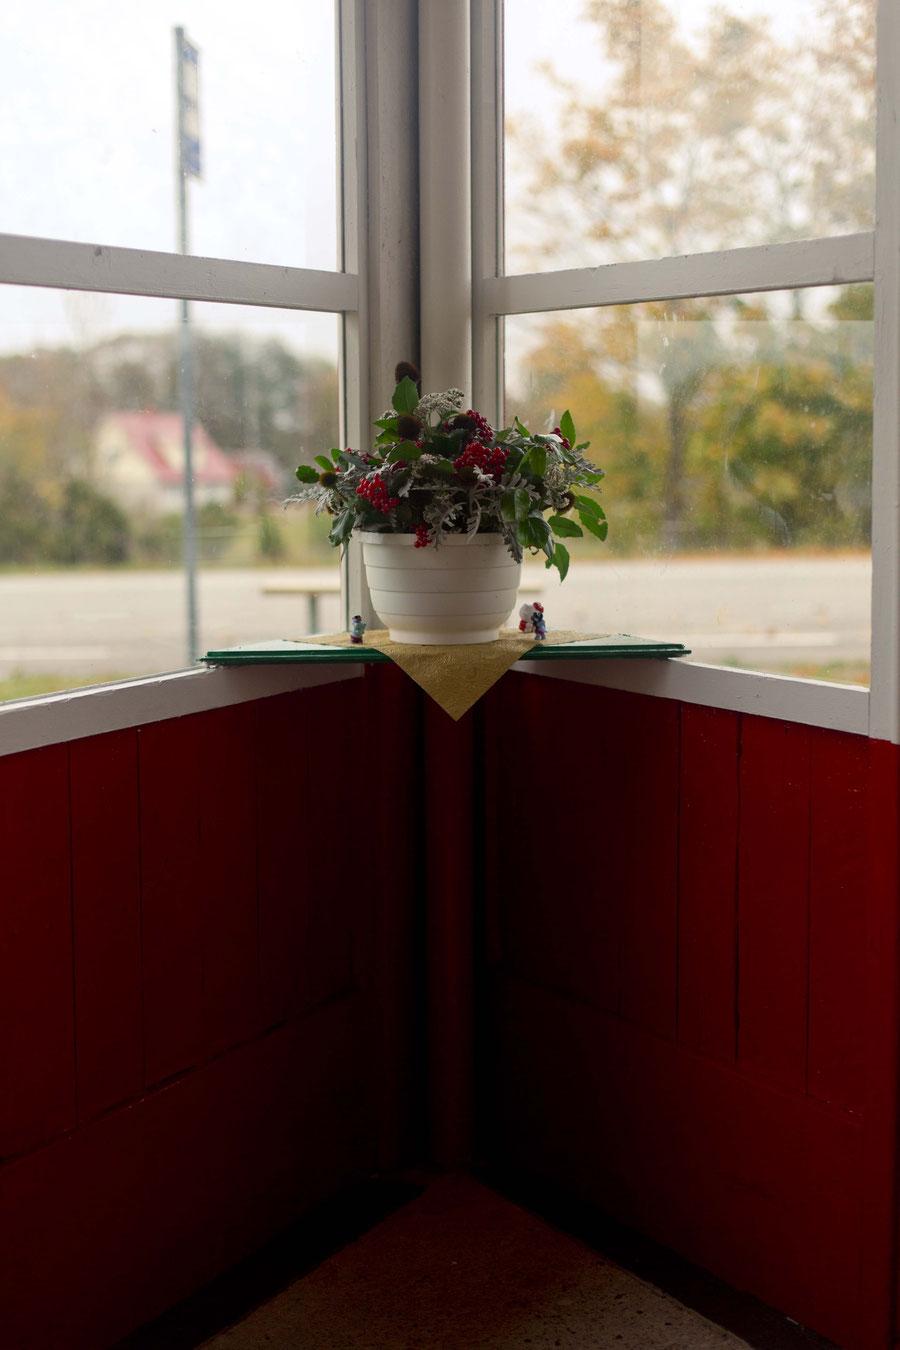 The most beautiful stop in Europe: Panga, from the inside. Saaremaa, Estonia.